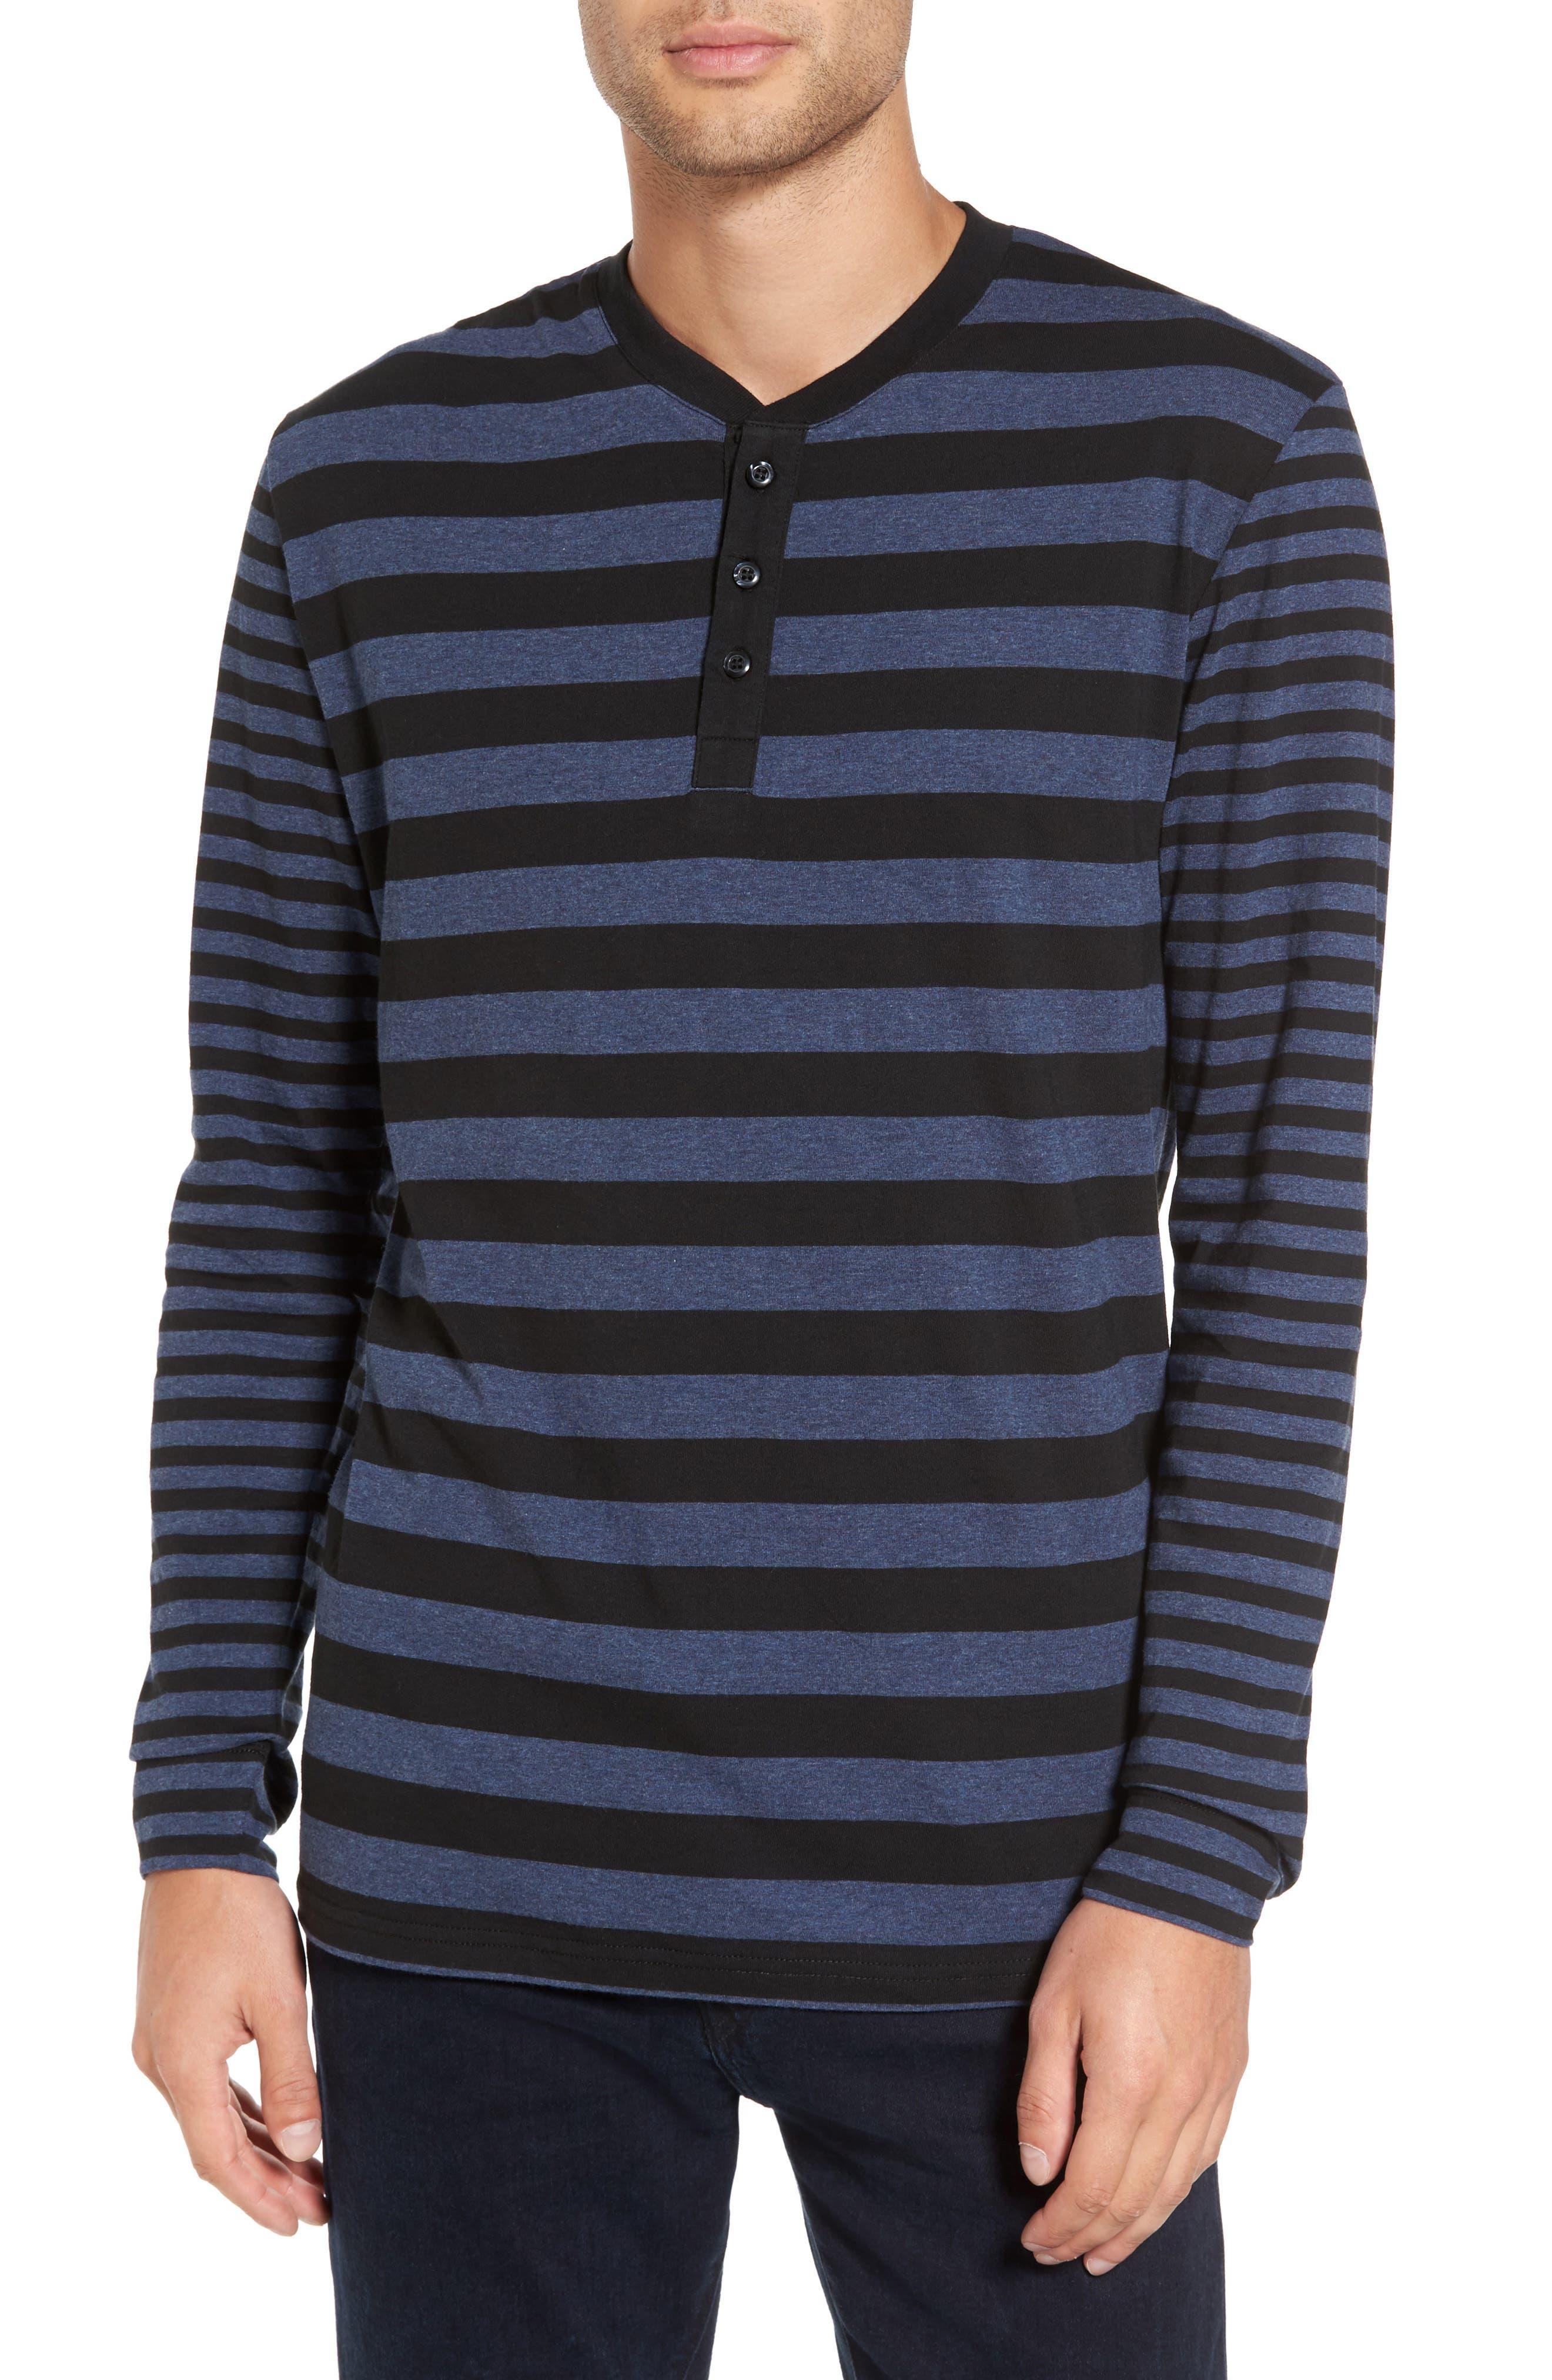 Slate & Stone Striped Long Sleeve Henley T-Shirt